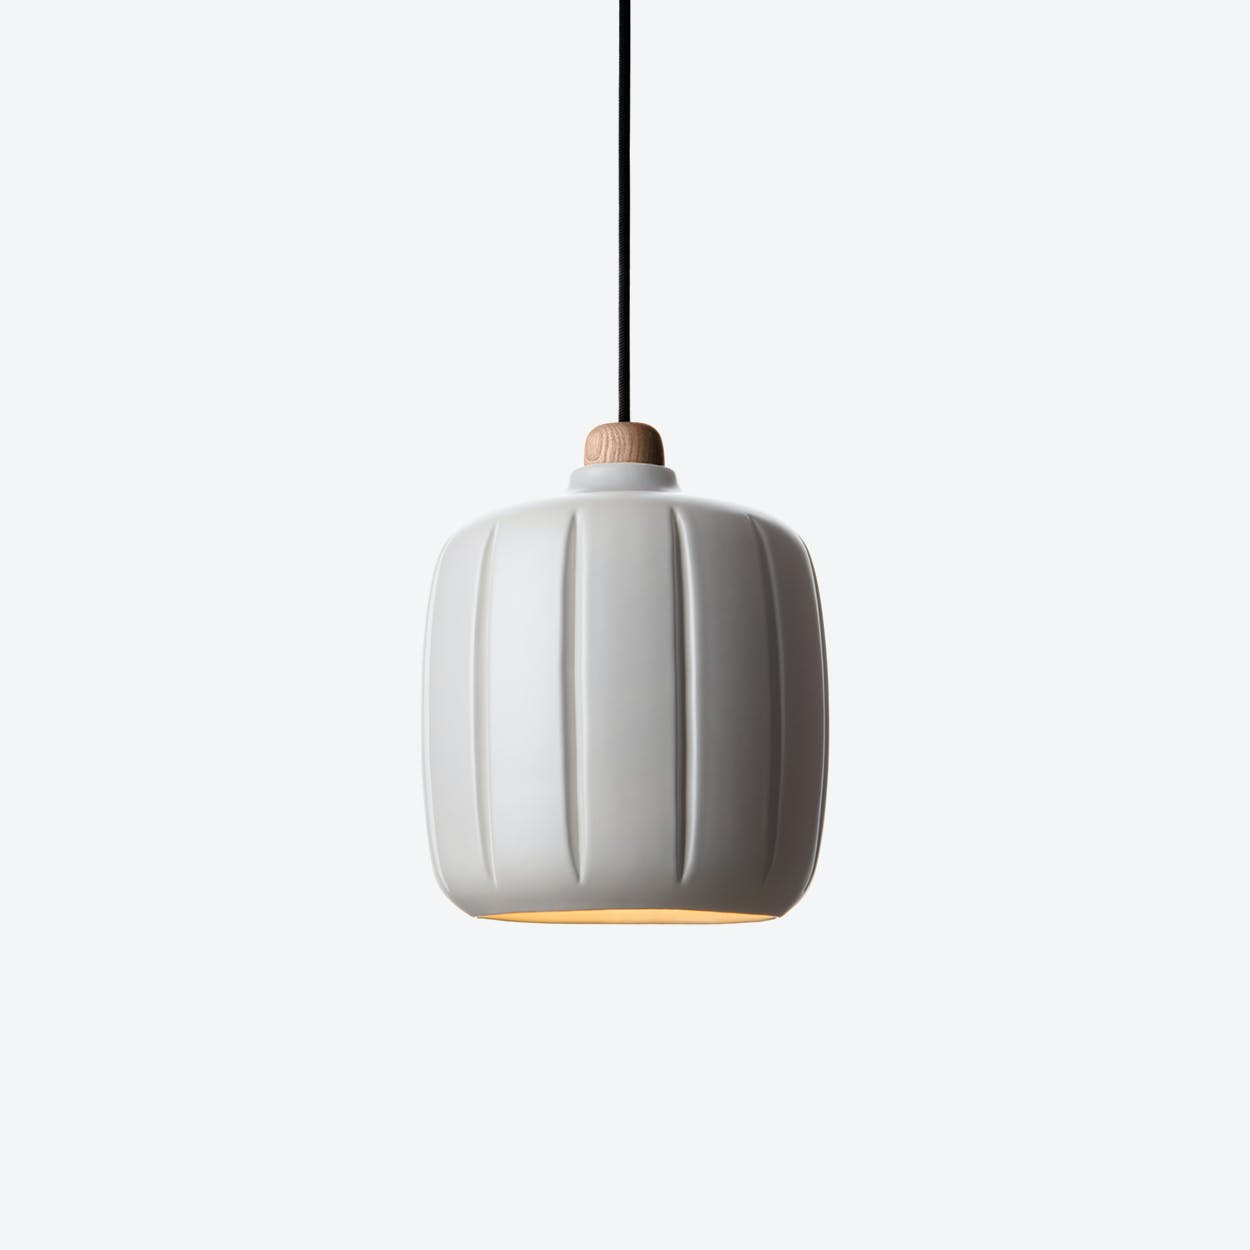 Cosse Small Pendant Lamp in Light Grey